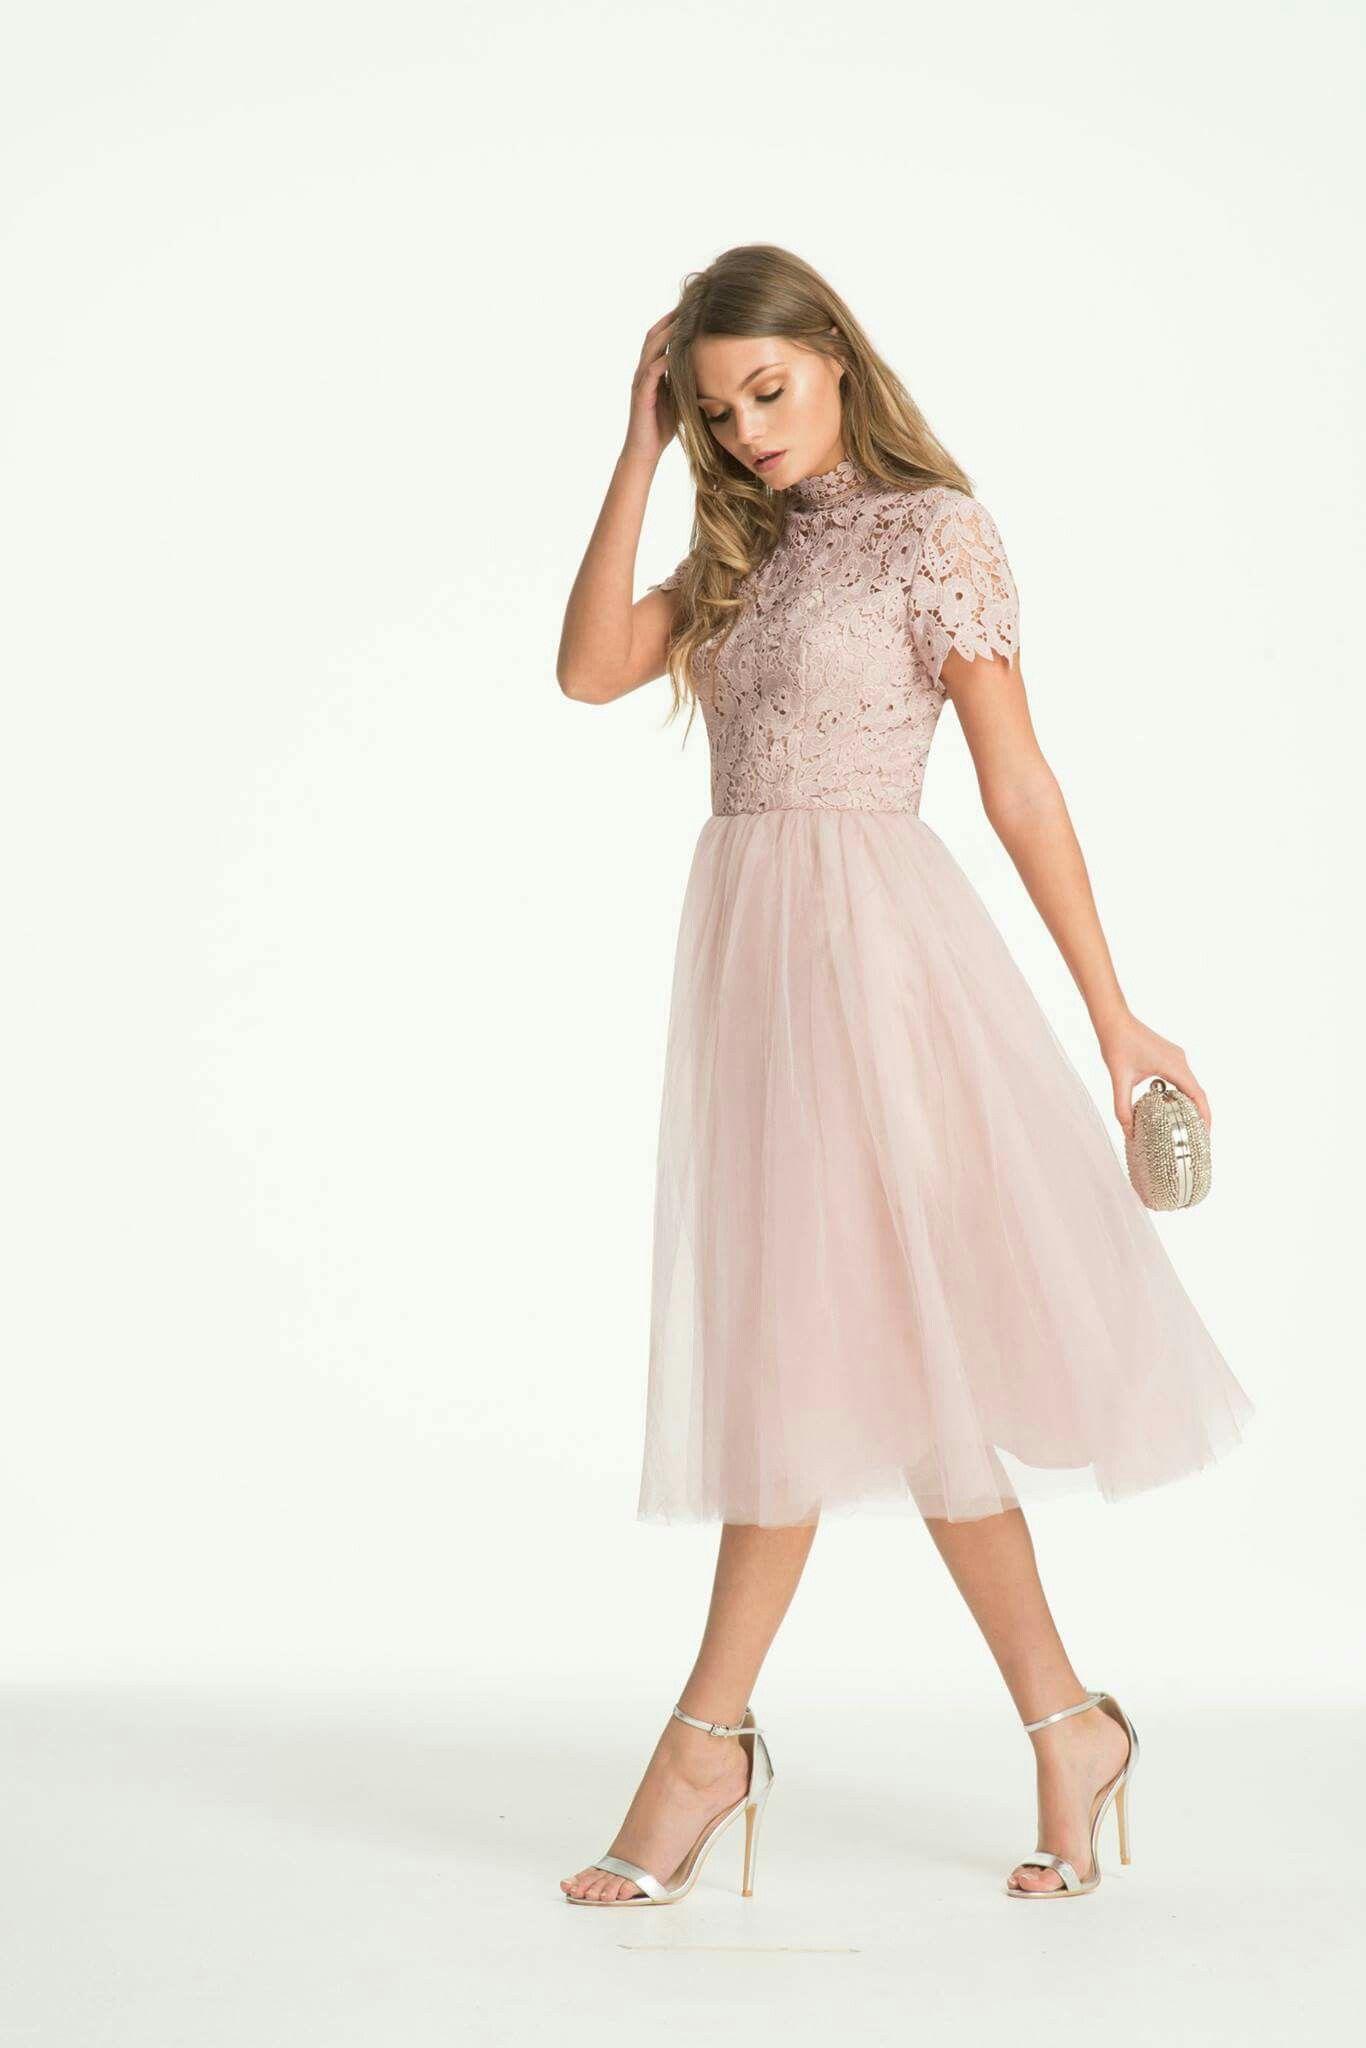 Rehearsal dress? Reception dress? | Prom dresses modest ...